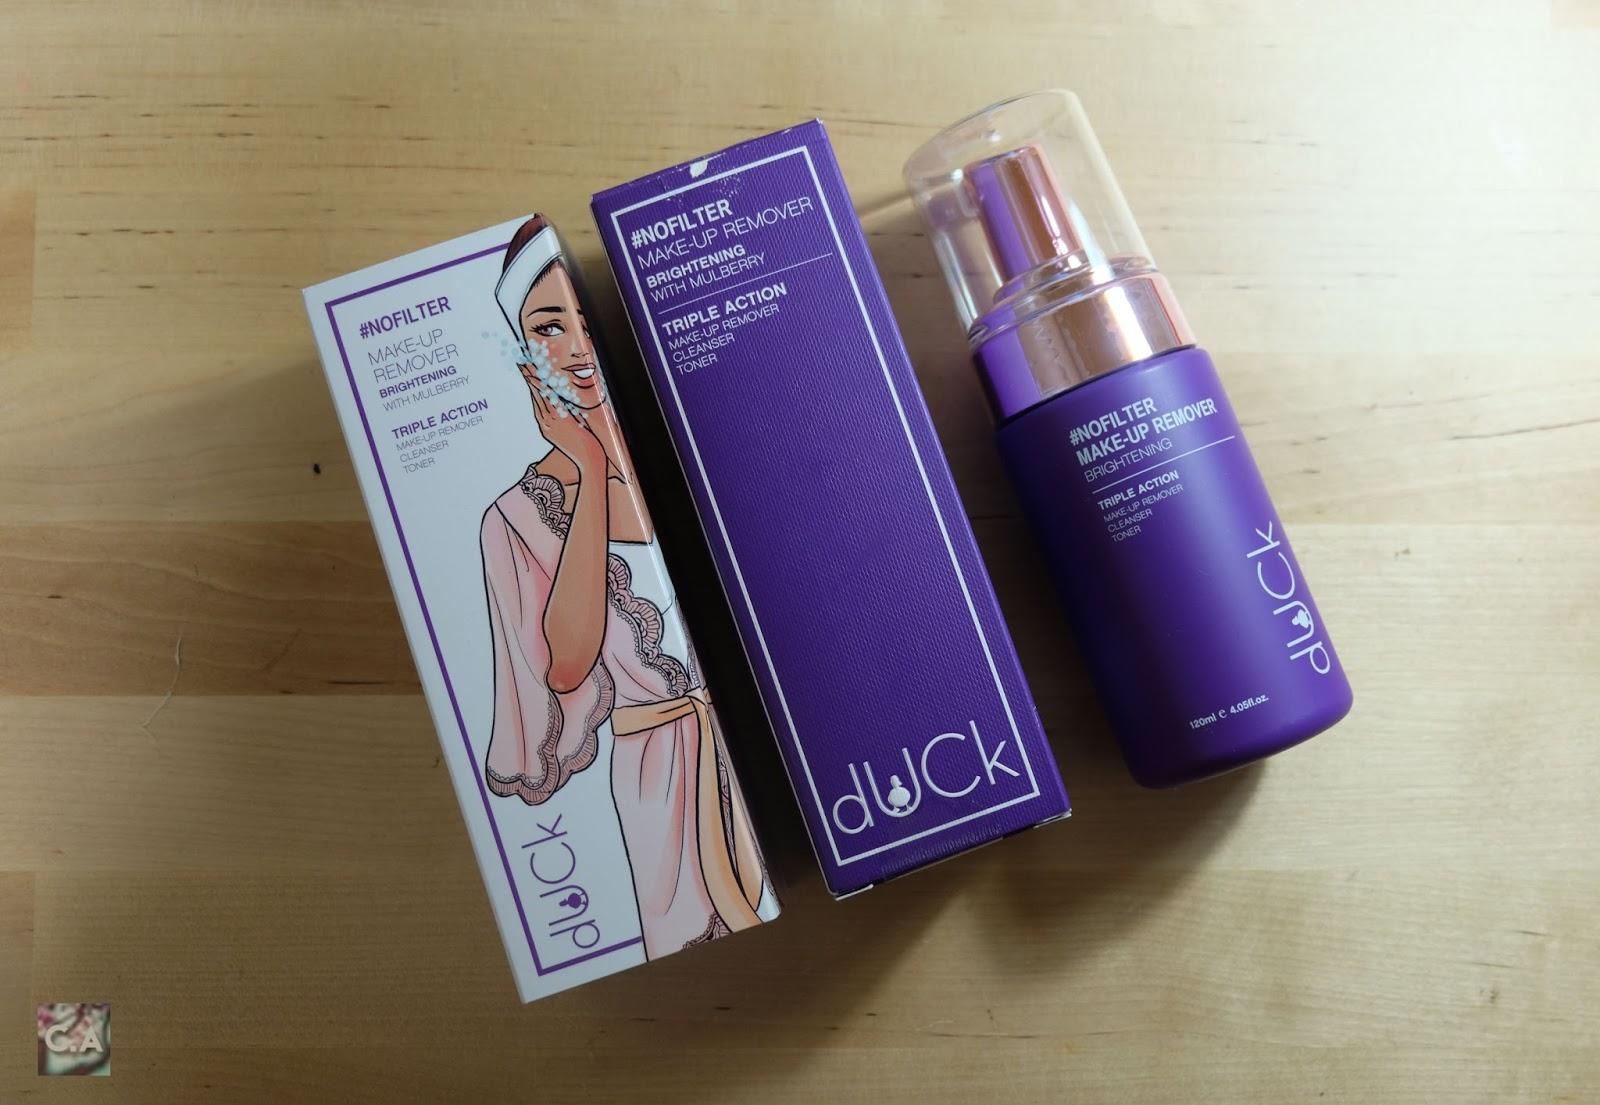 dUck Cosmetics #nofilter Make-up Remover - Brightening Curitan Aqalili